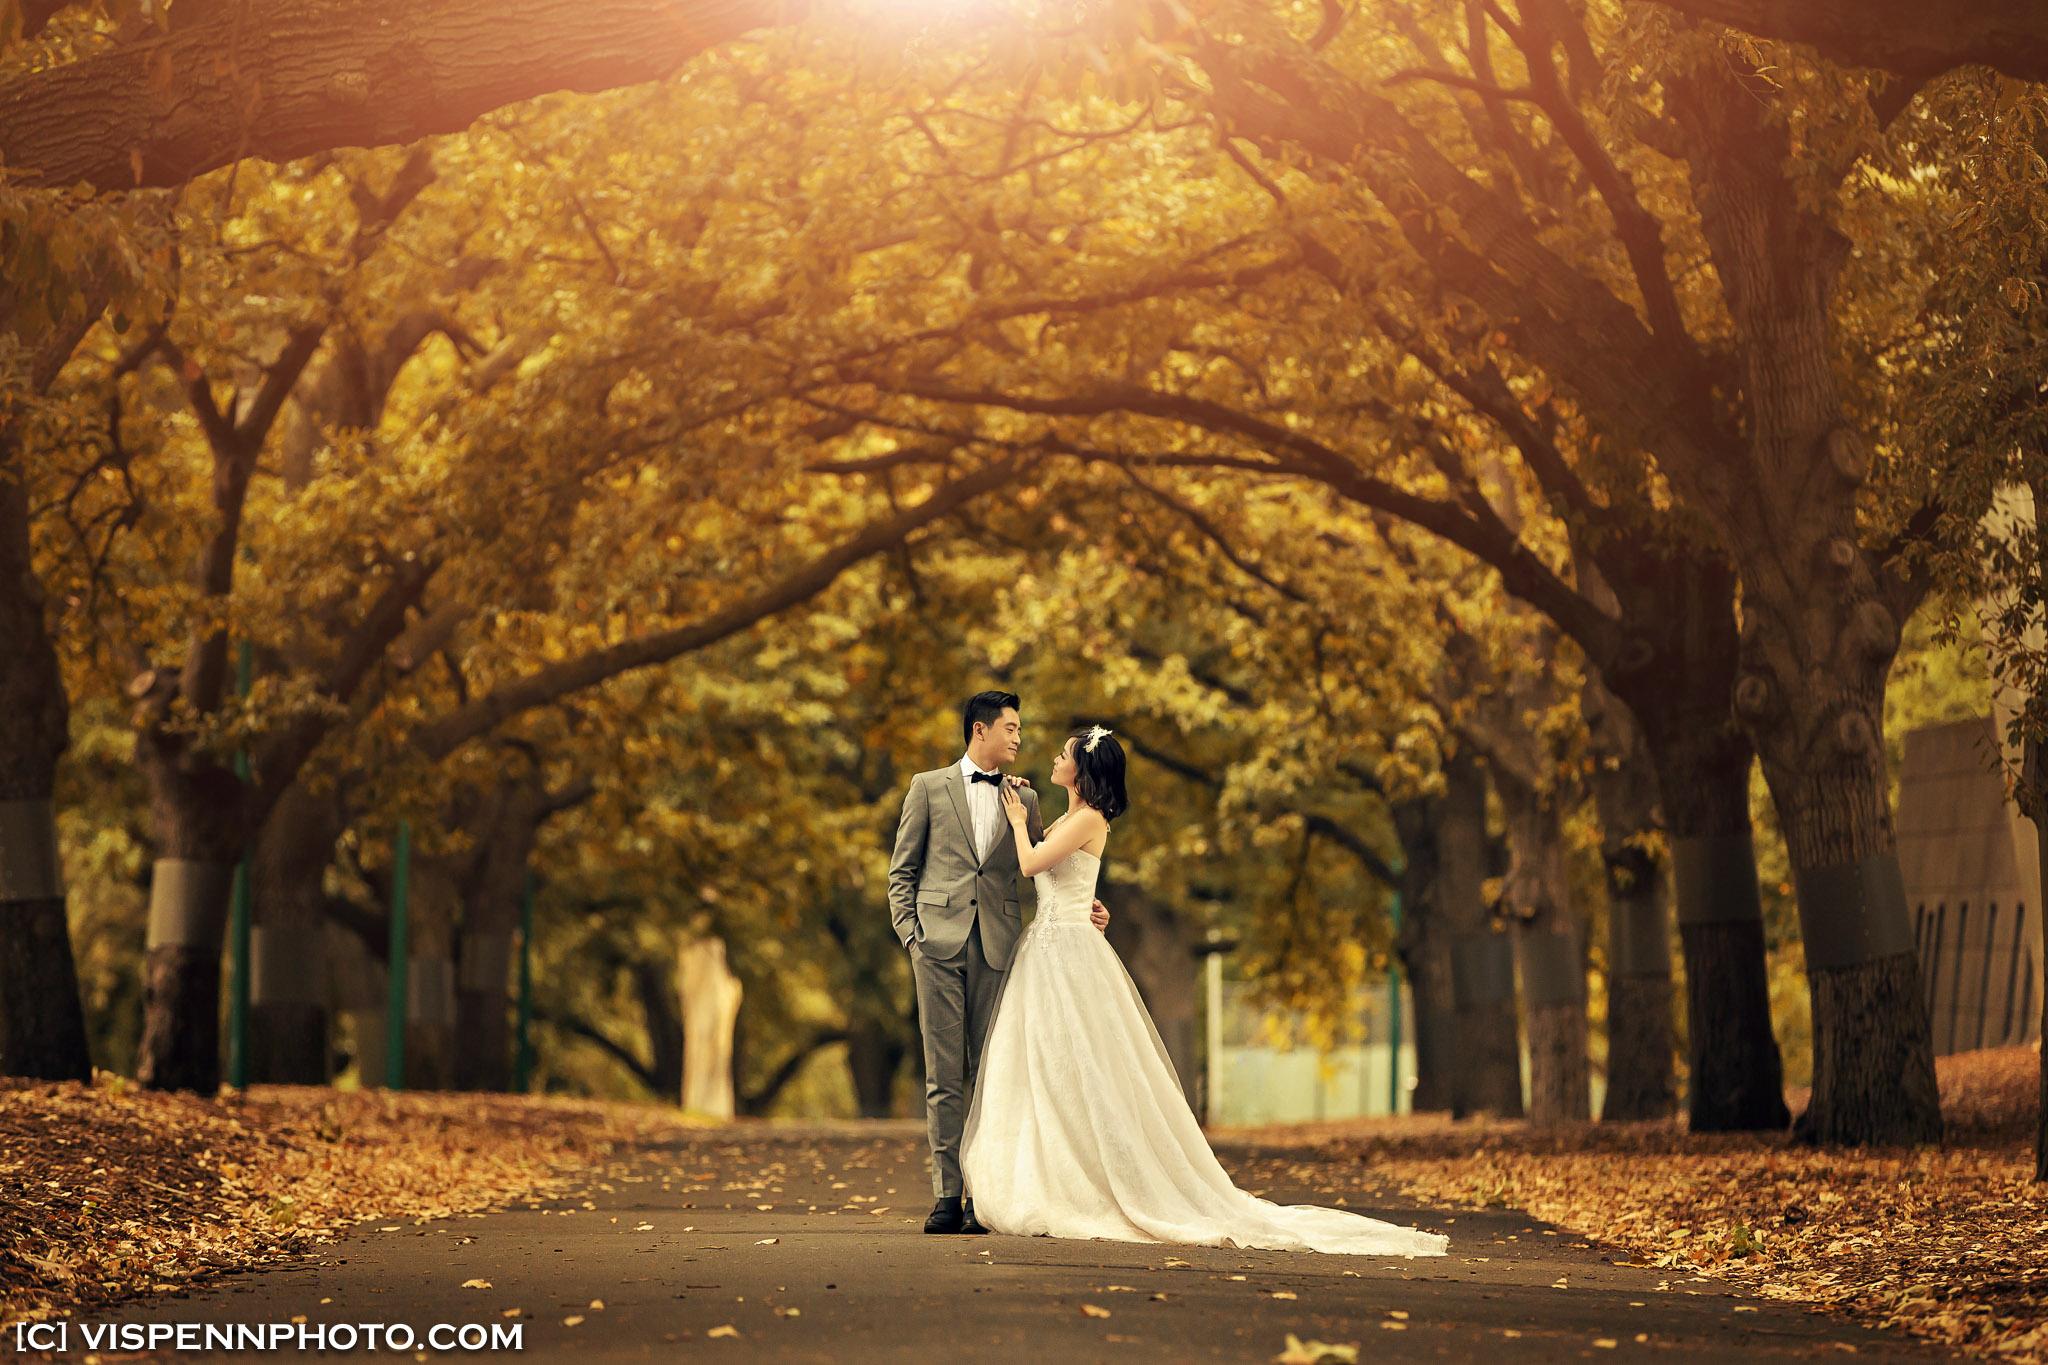 PRE WEDDING Photography Melbourne VISPENN 墨尔本 婚纱照 结婚照 婚纱摄影 Pauline 2163